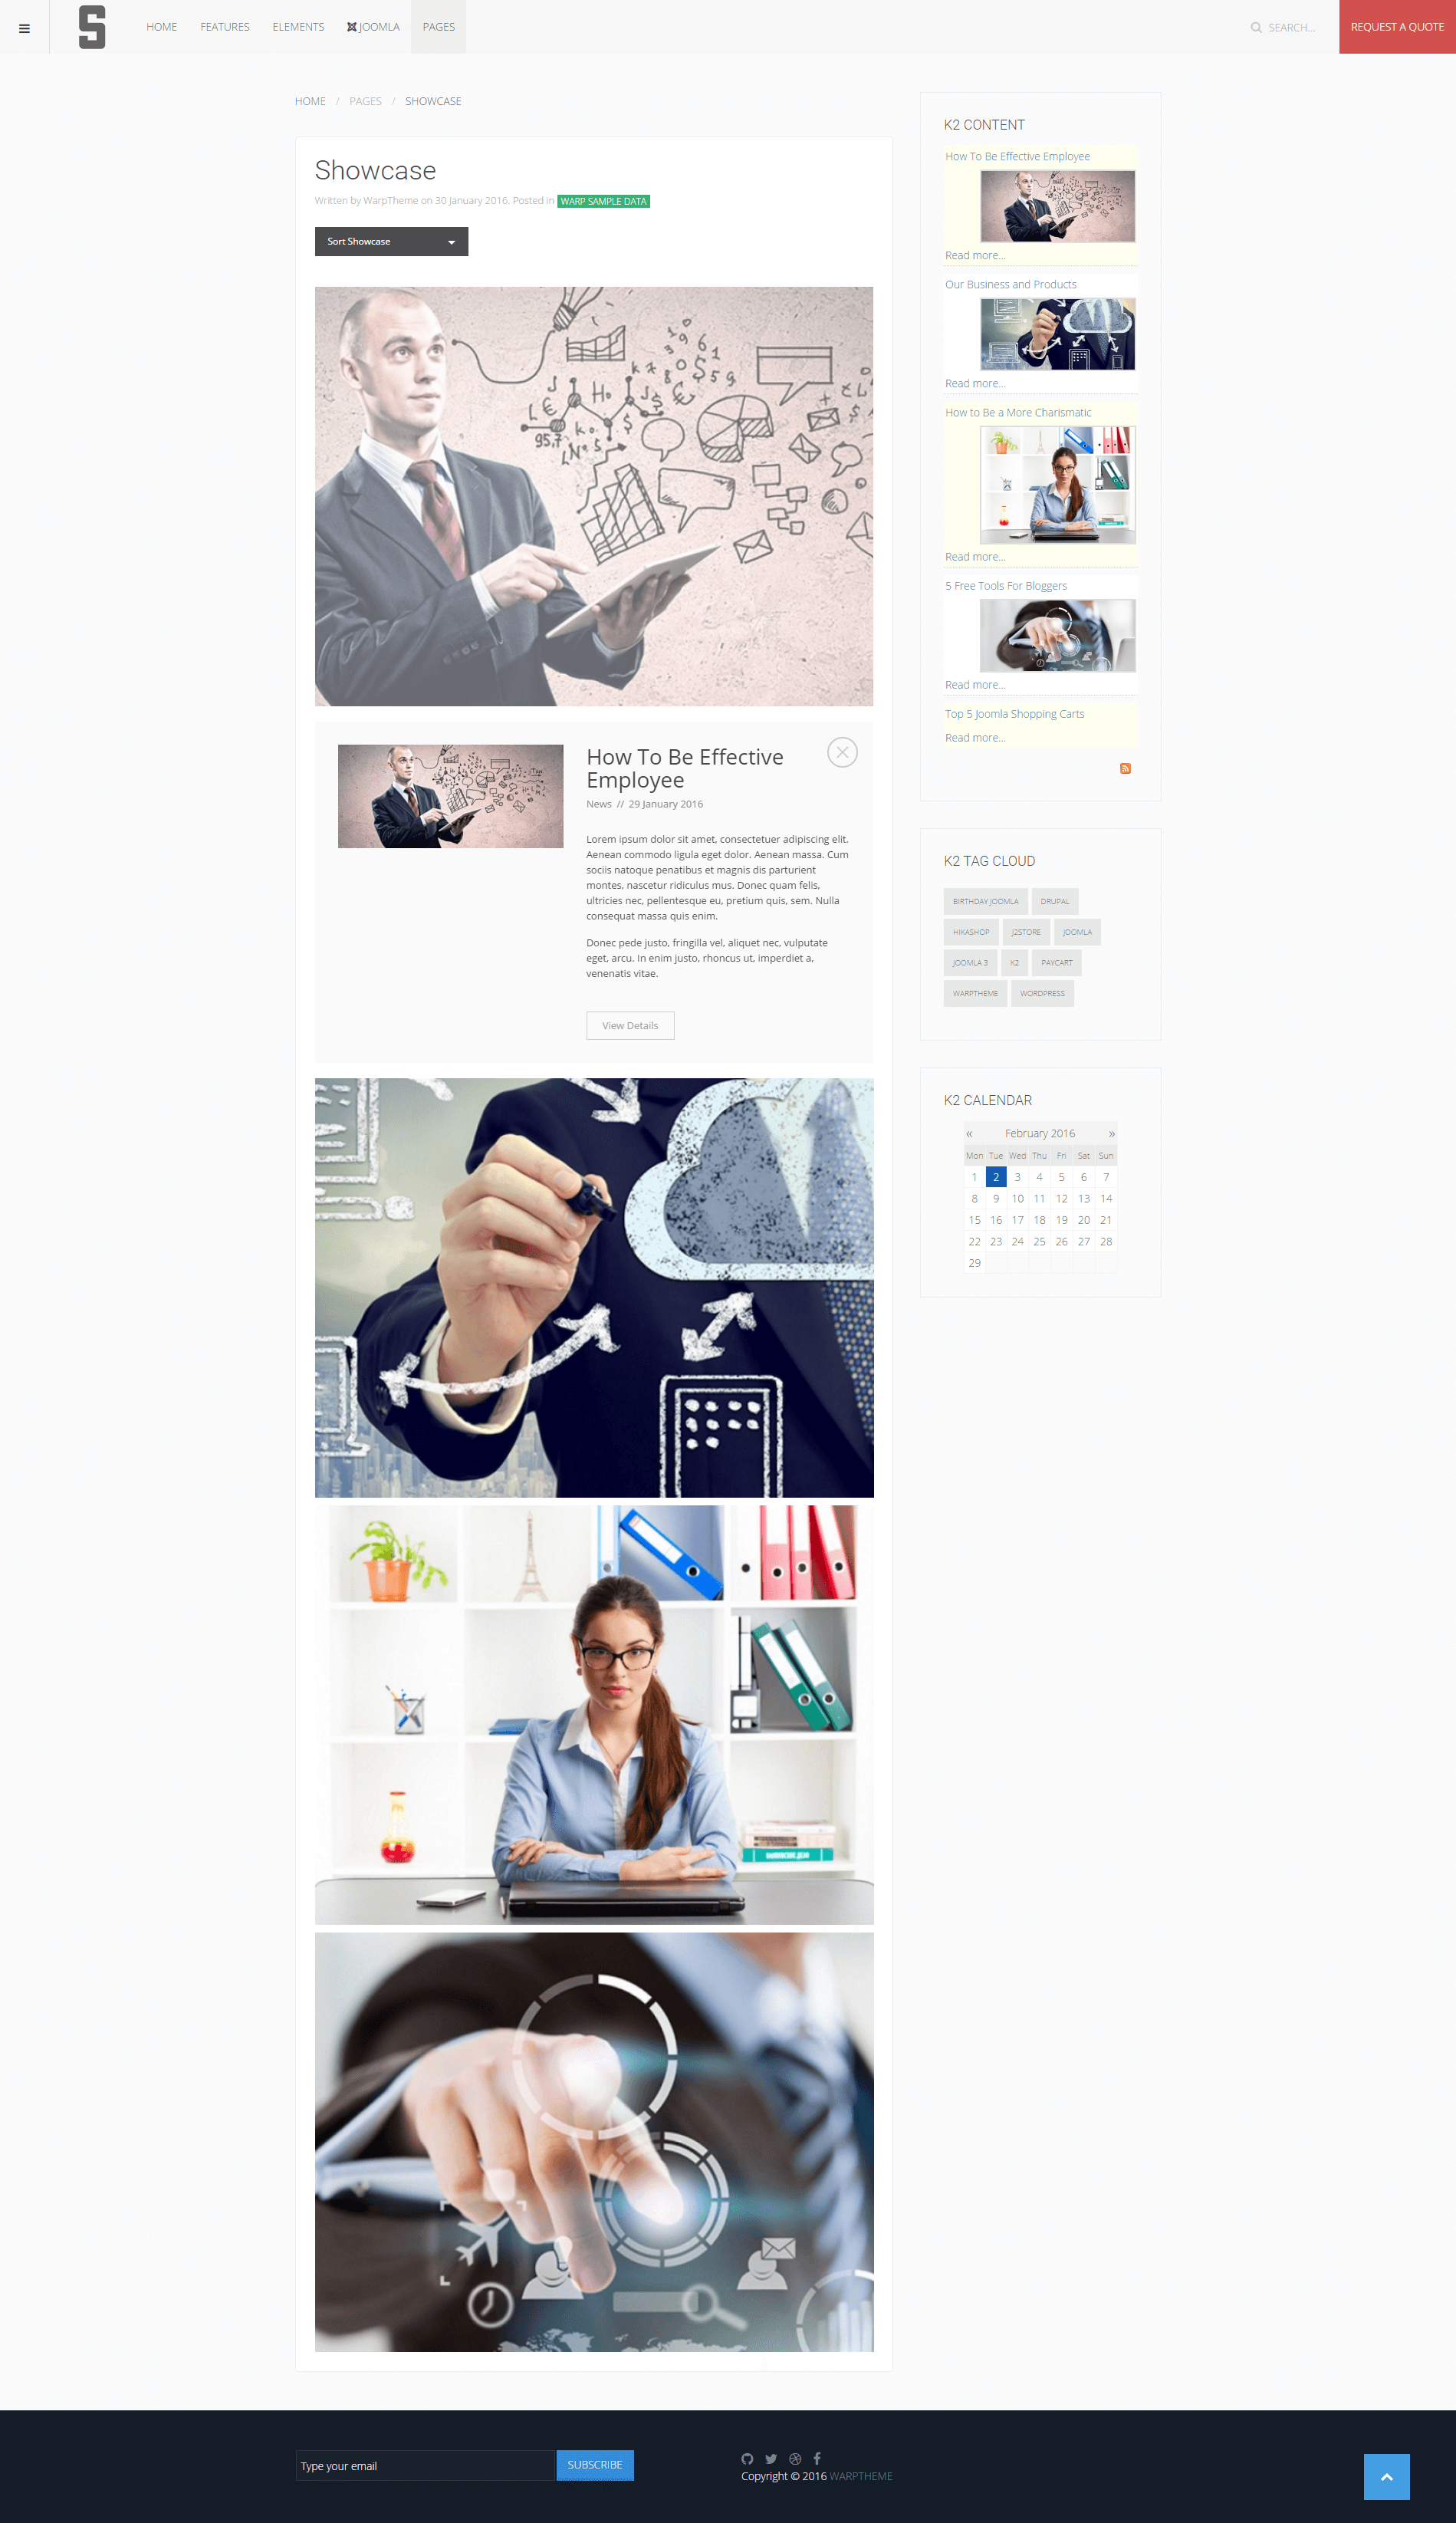 S Showcase page